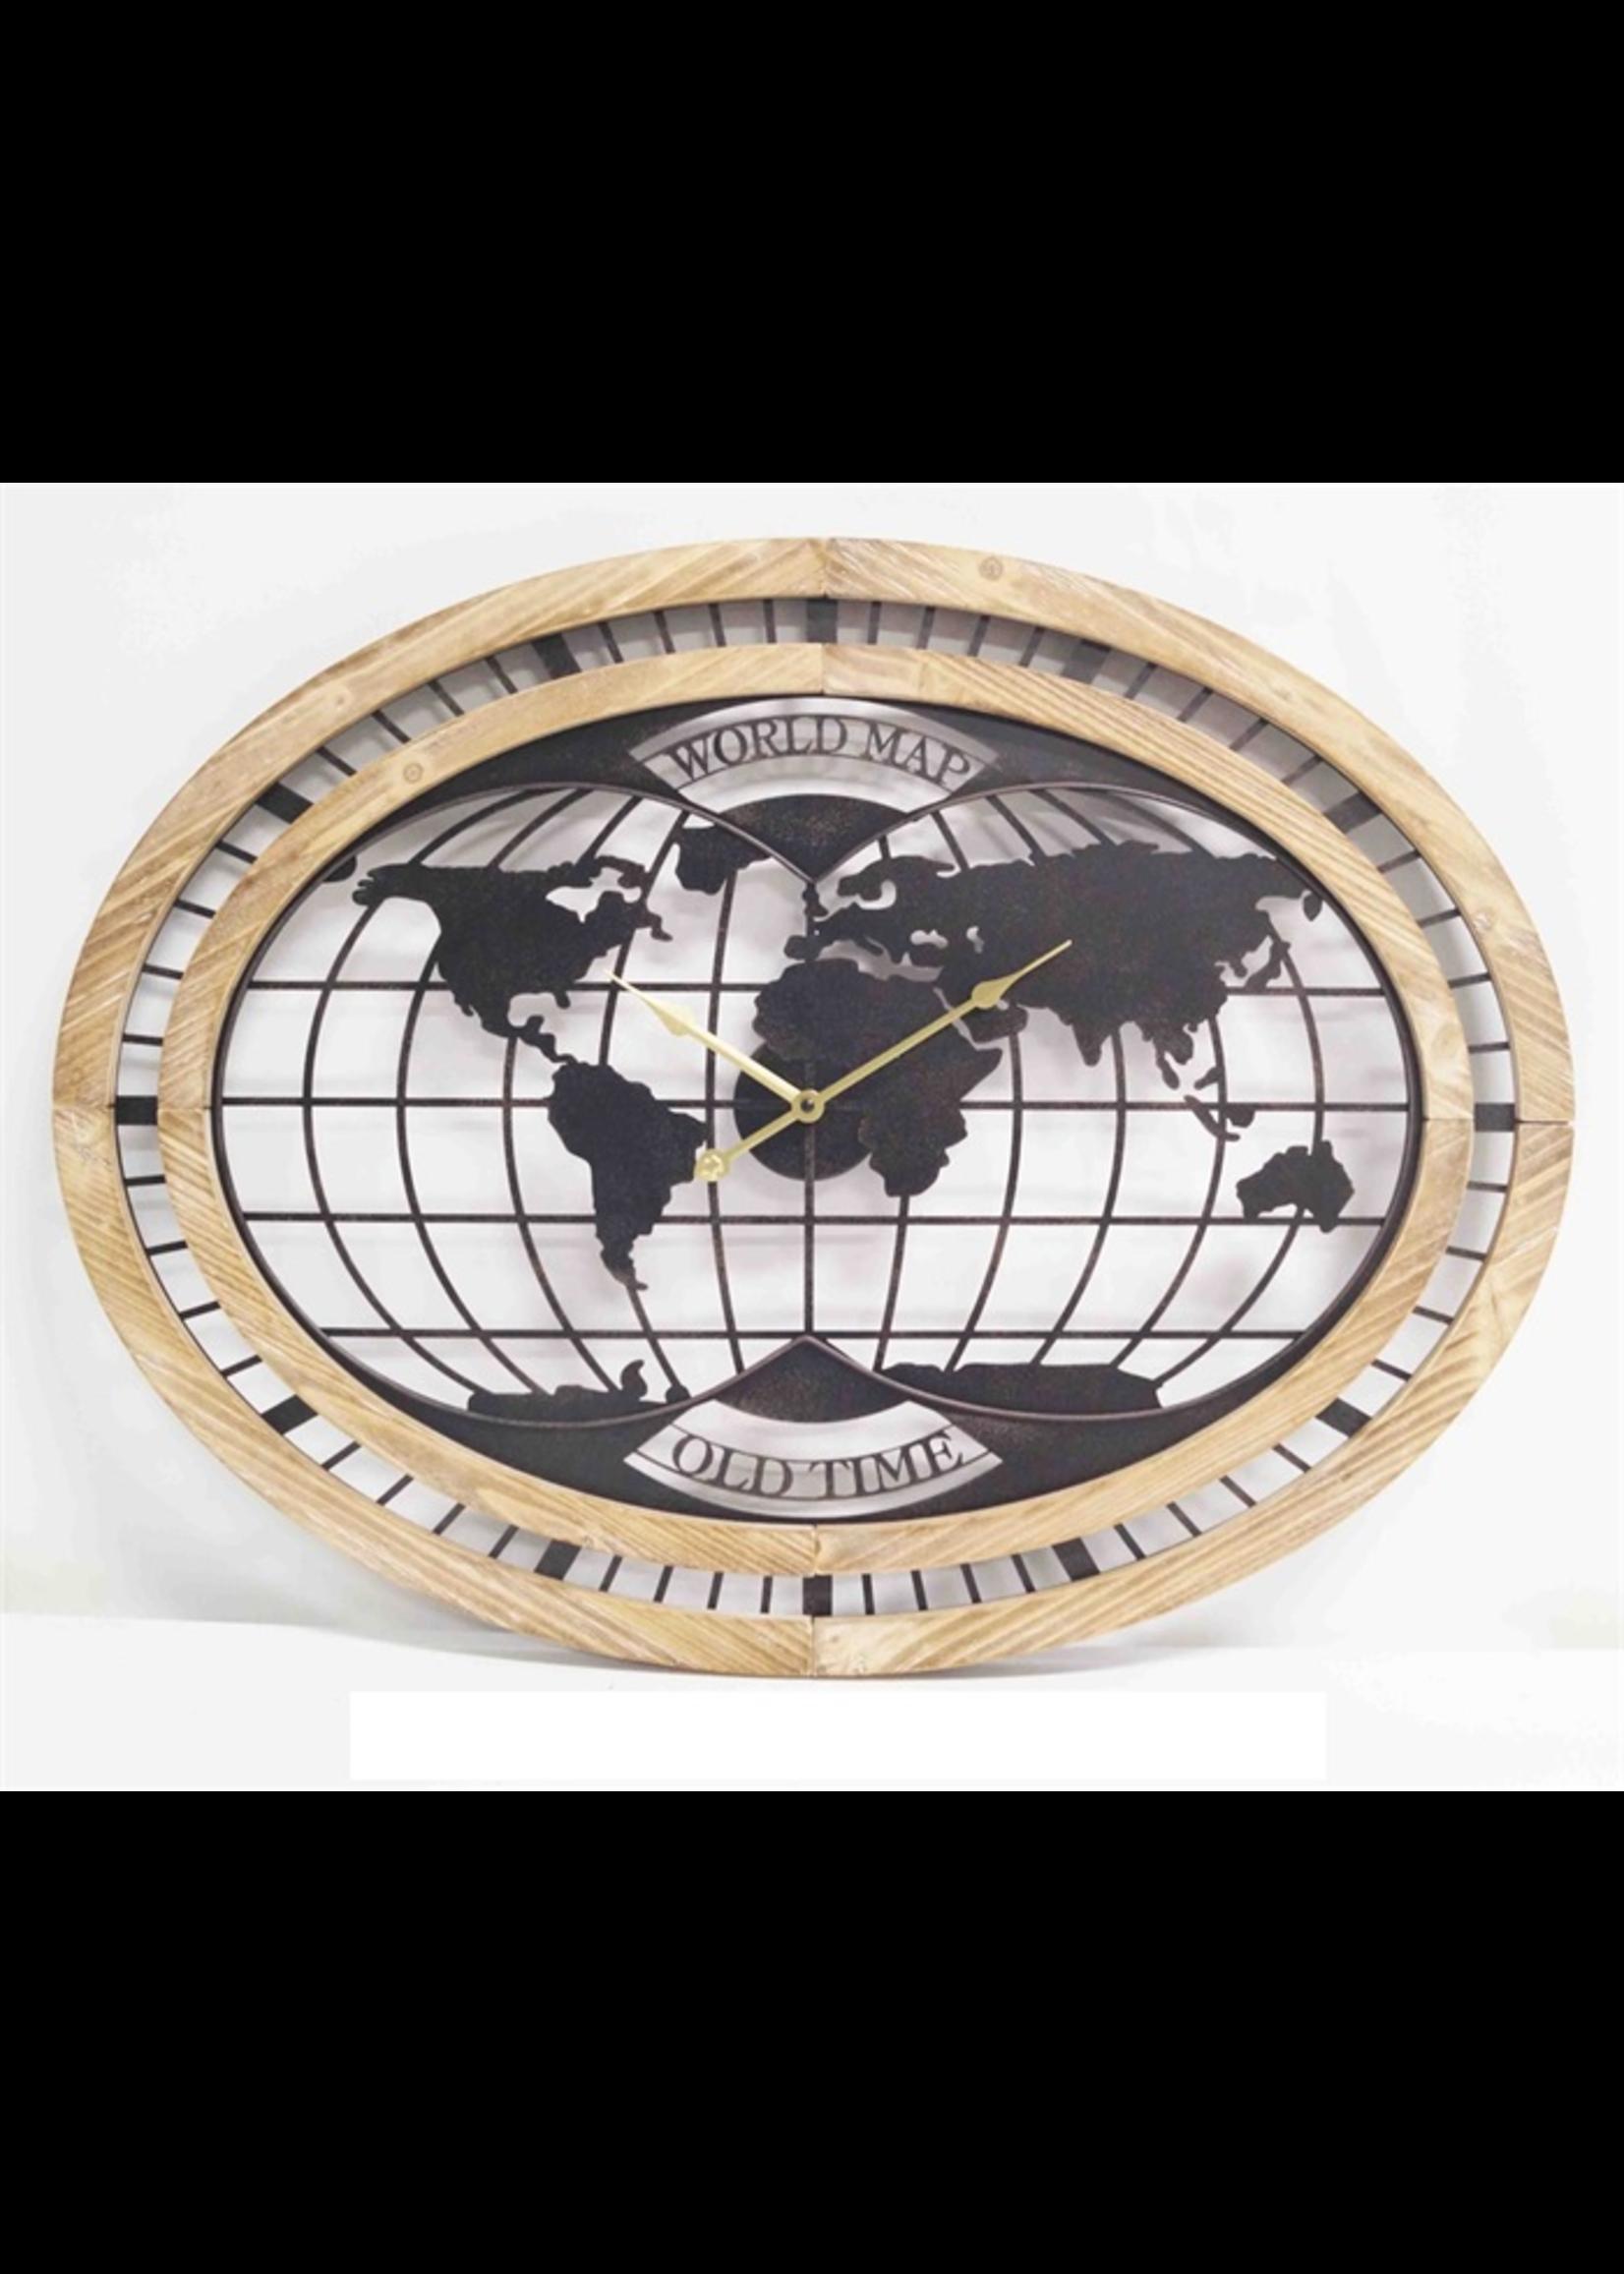 Klokkendiscounter Wandklok World Map Modern Industrieel Design